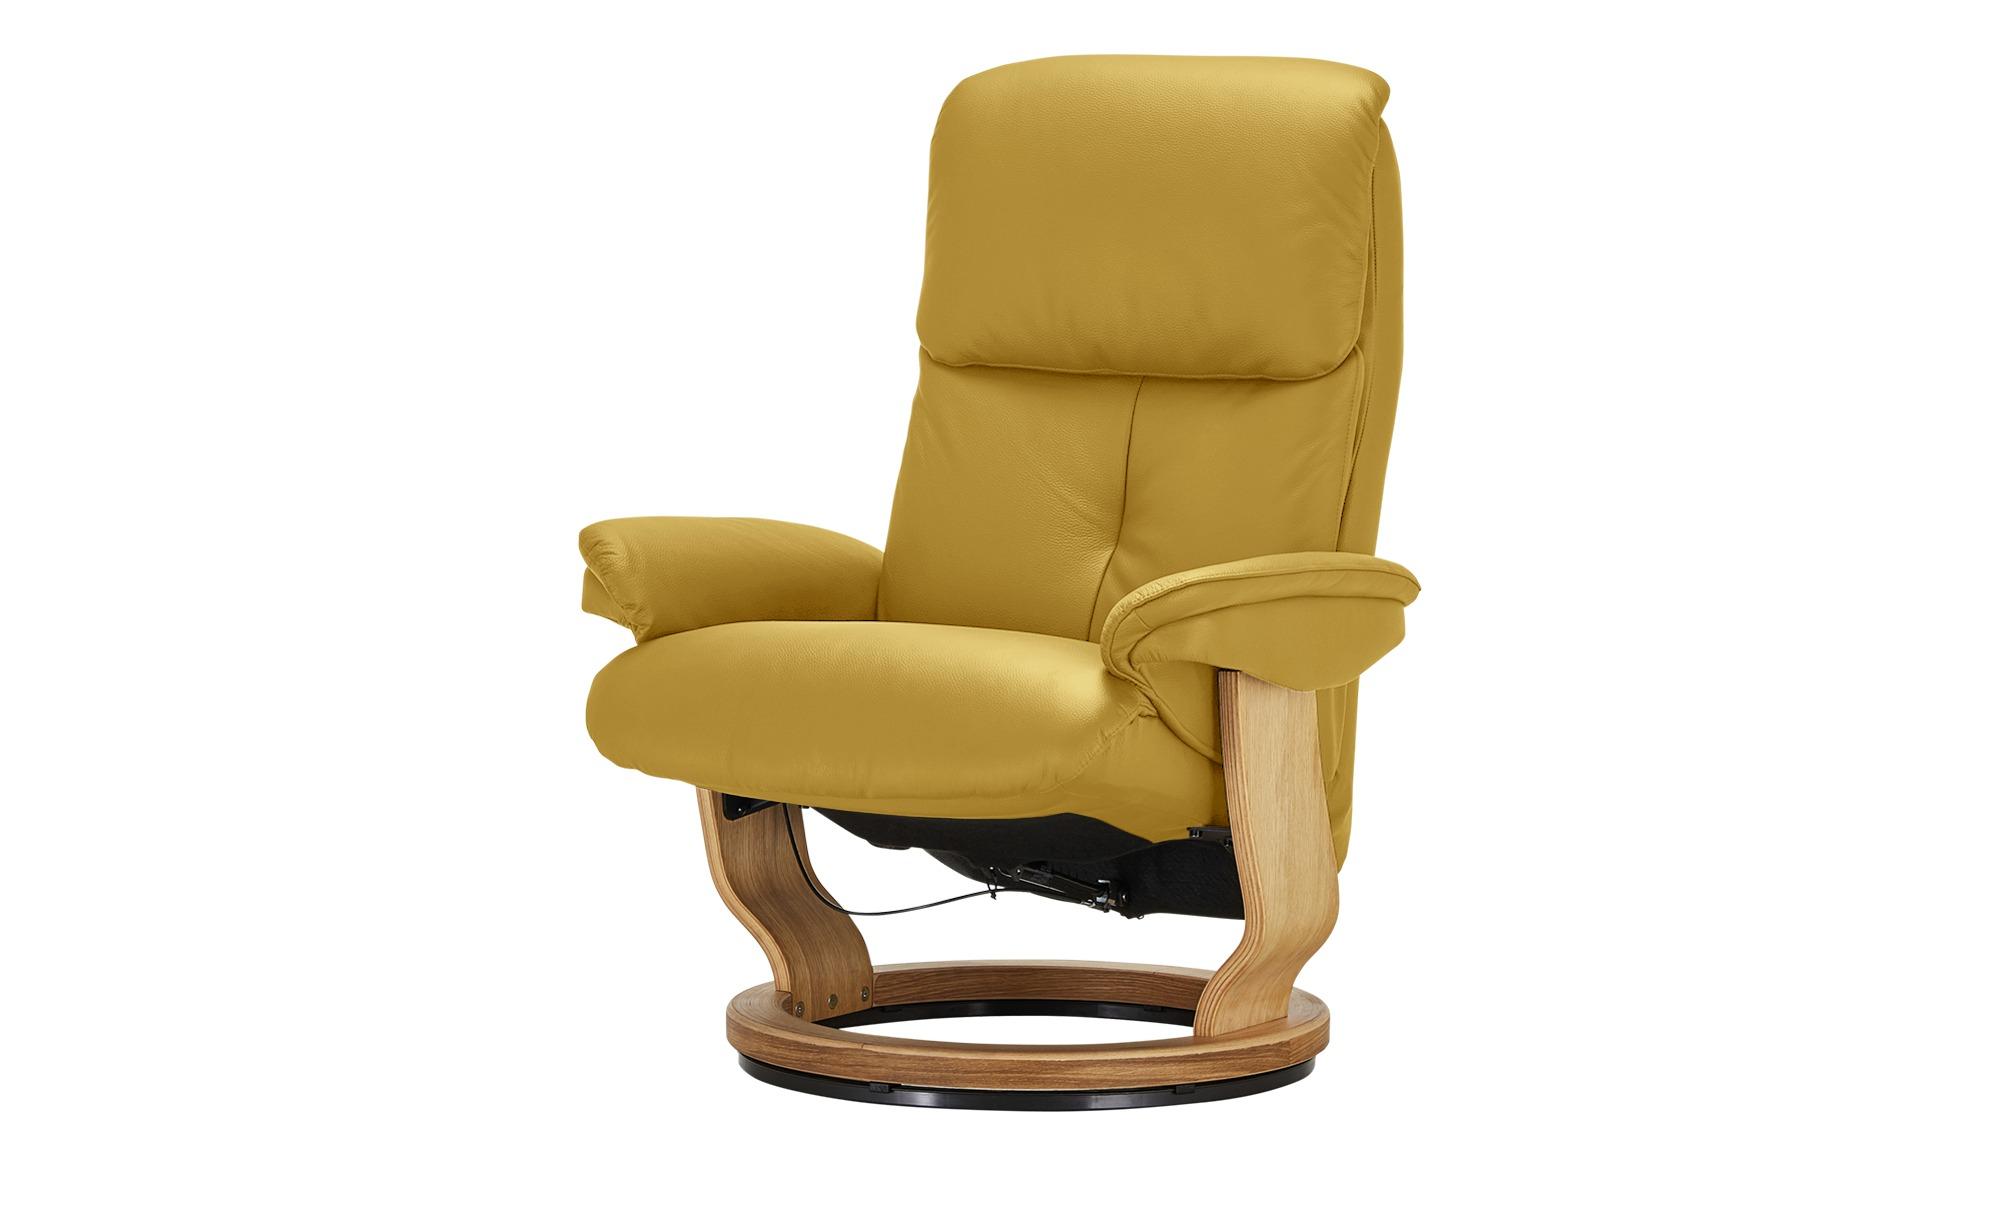 Relaxsessel  Farso ¦ gelb ¦ Maße (cm): B: 85 H: 114 T: 92 Polstermöbel > Sessel > Ledersessel - Höffner